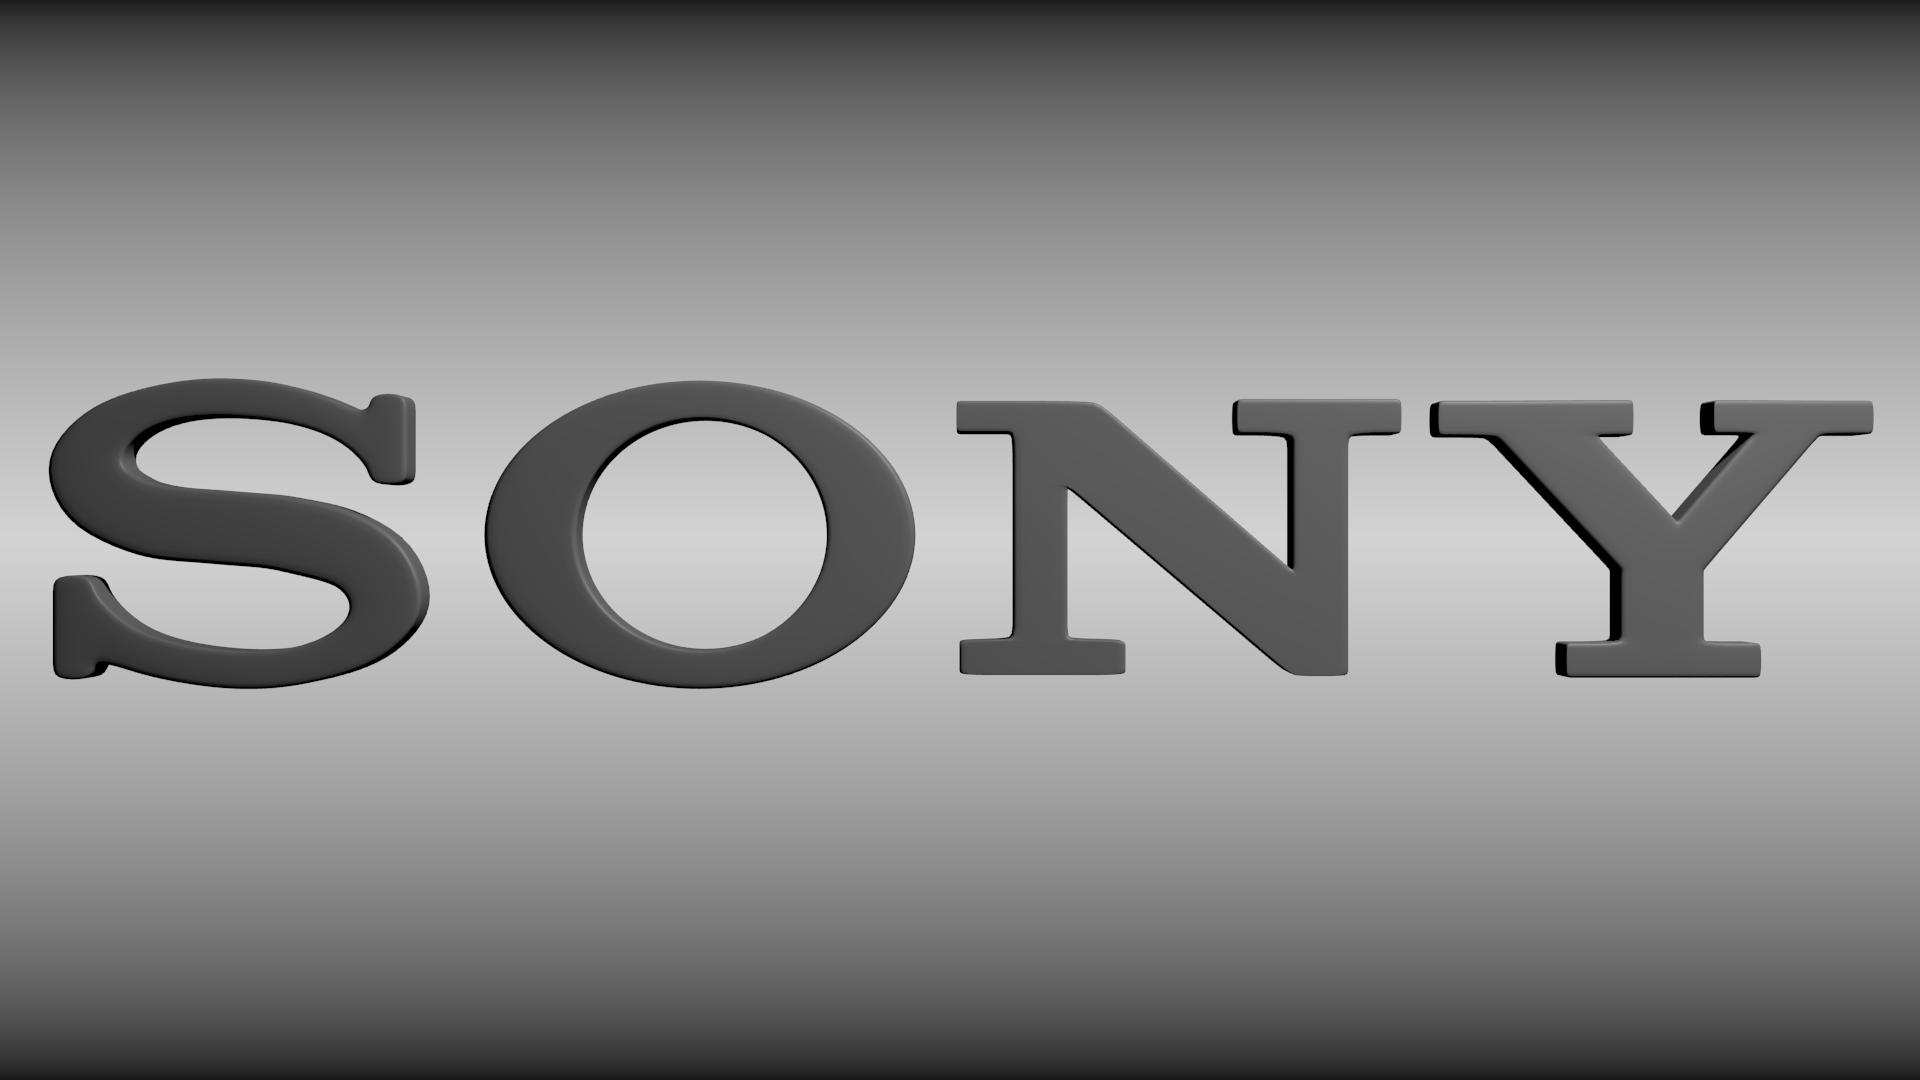 Sony logo wallpapers top free sony logo backgrounds wallpaperaccess - Sony bravia logo hd ...